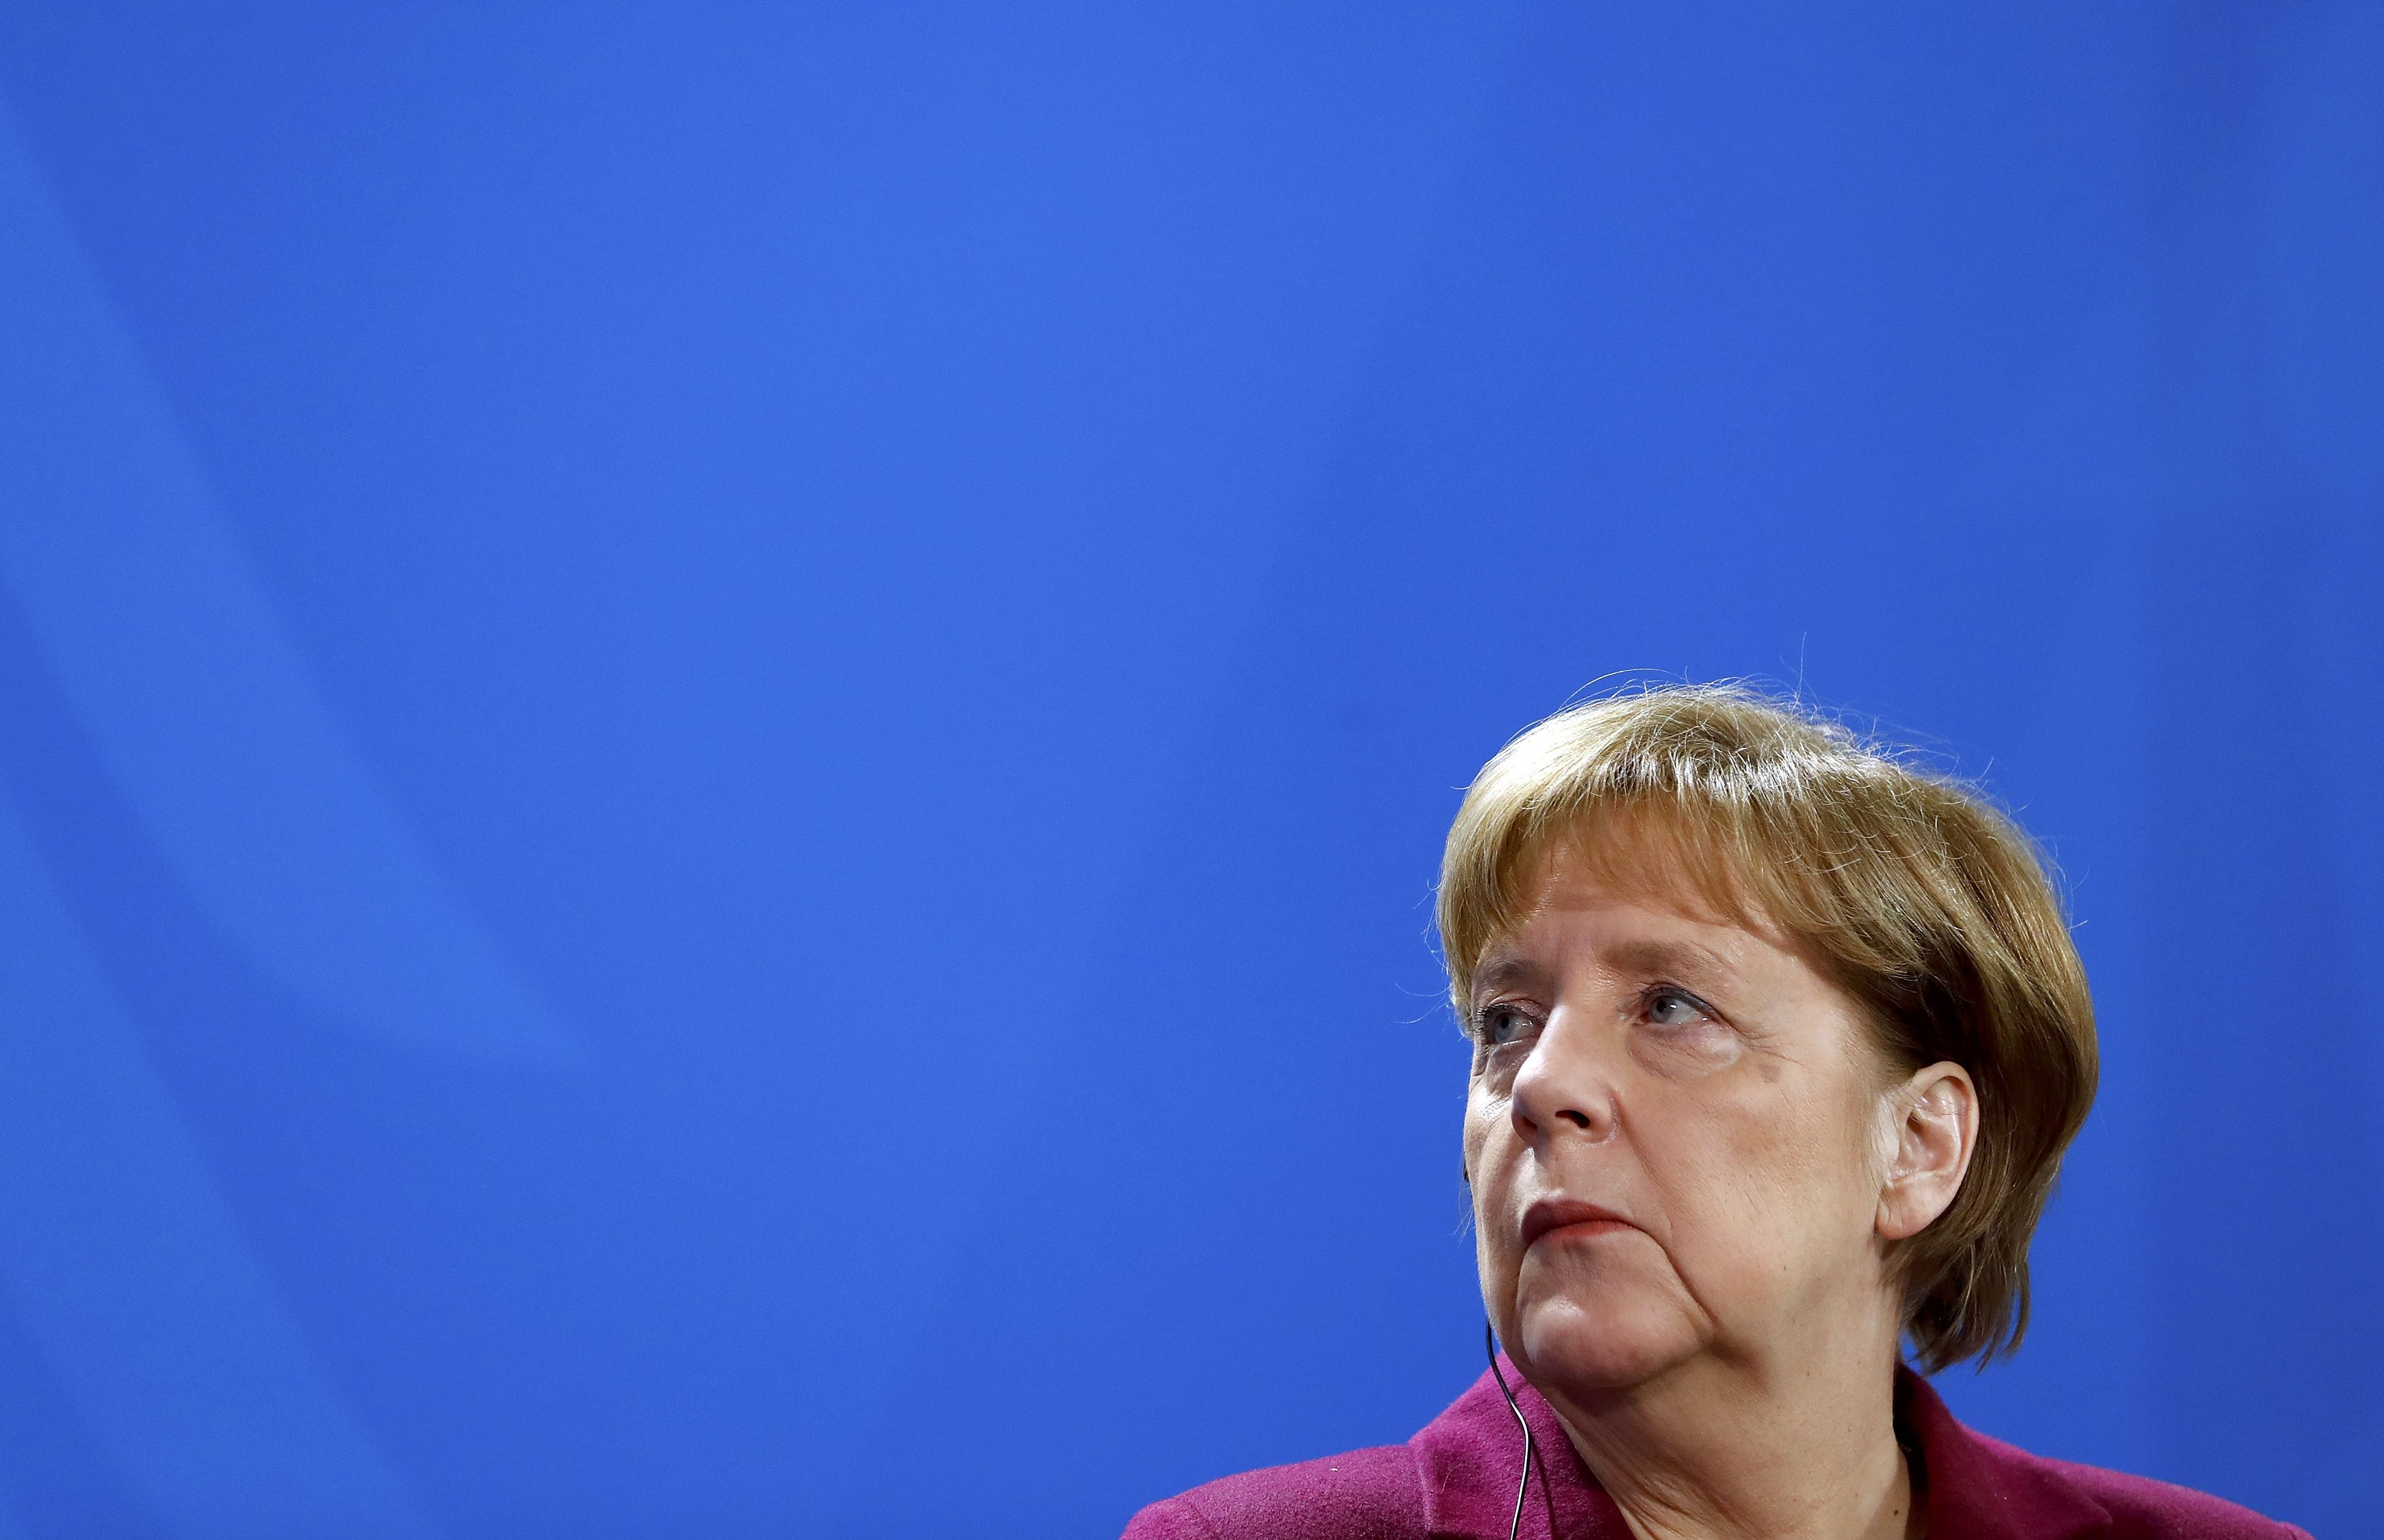 German Chancellor Angela Merkel gives a statement at the Chancellery in Berlin. REUTERS/Fabrizio Bensch